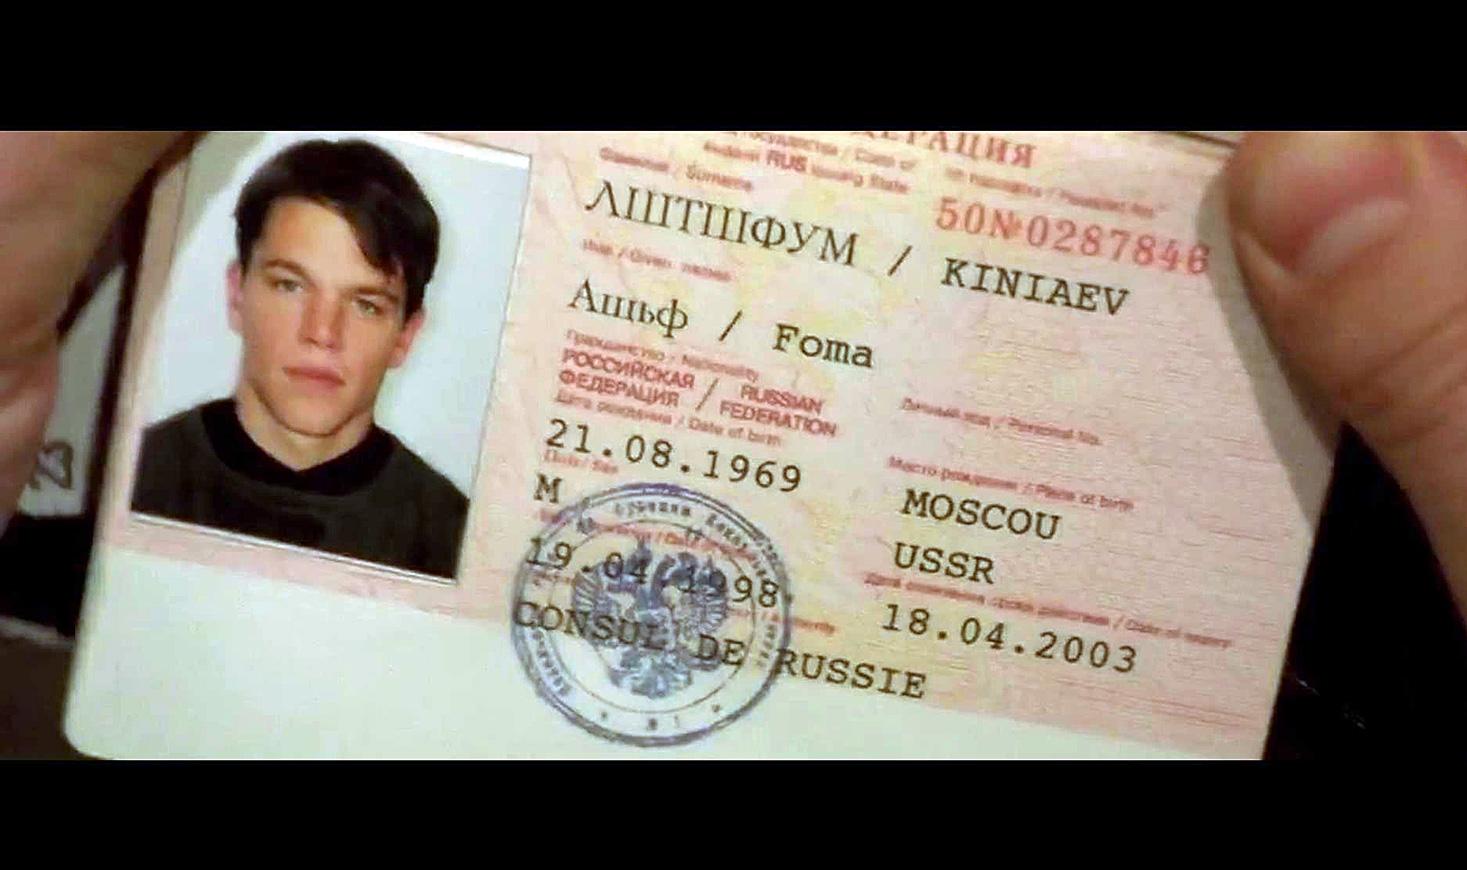 The Bourne Identity. Sumber: Cuplikan layar dari film